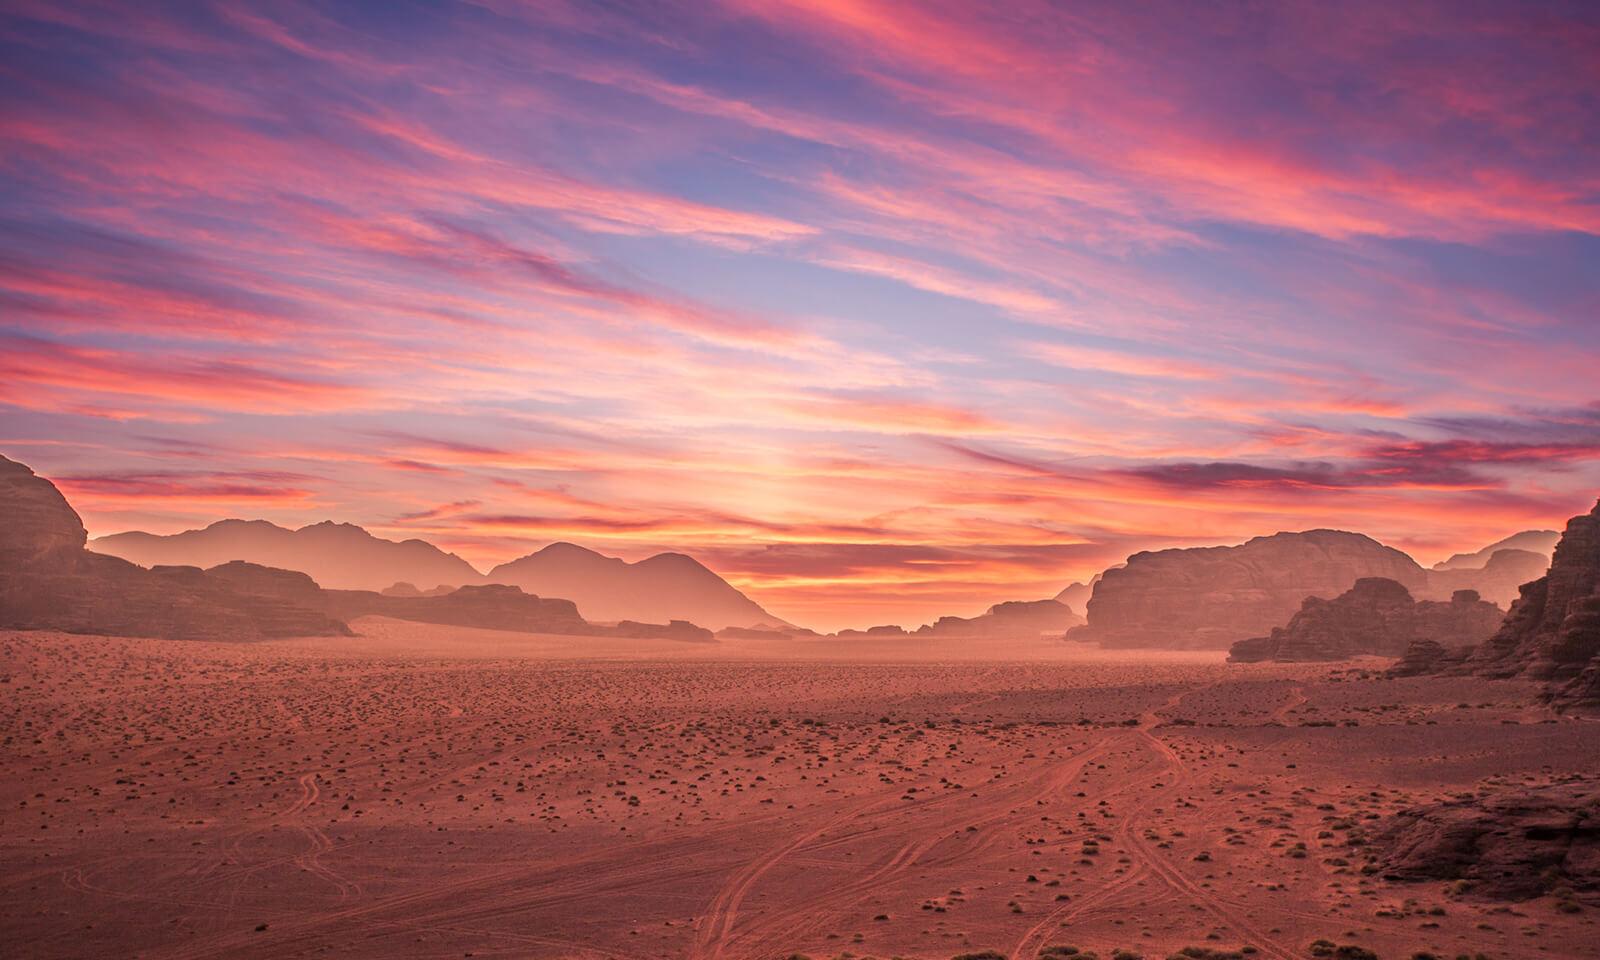 Poušť Wadi Rum během západu slunce.